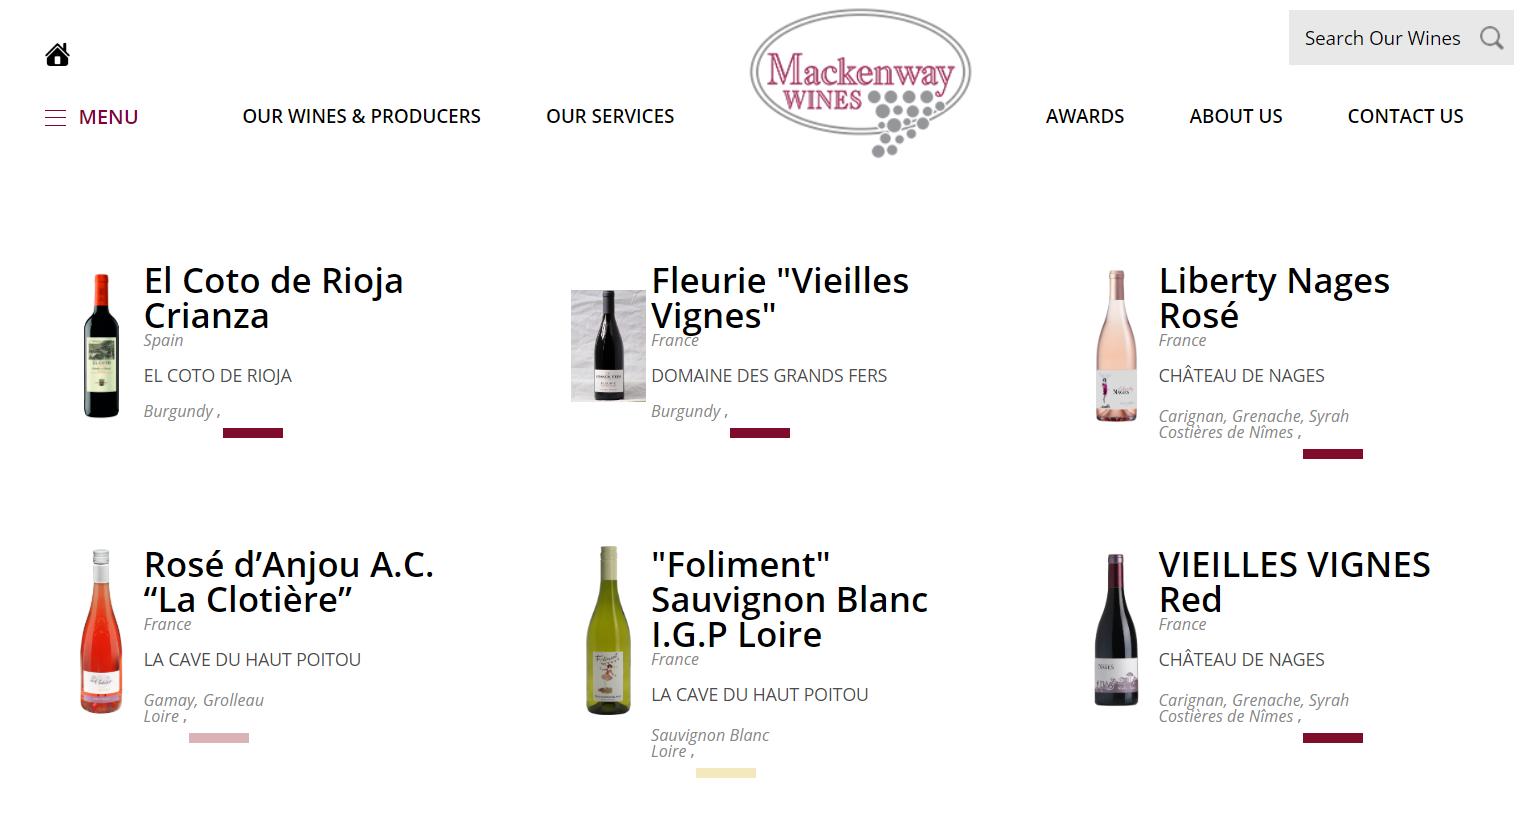 Mackenway Wines